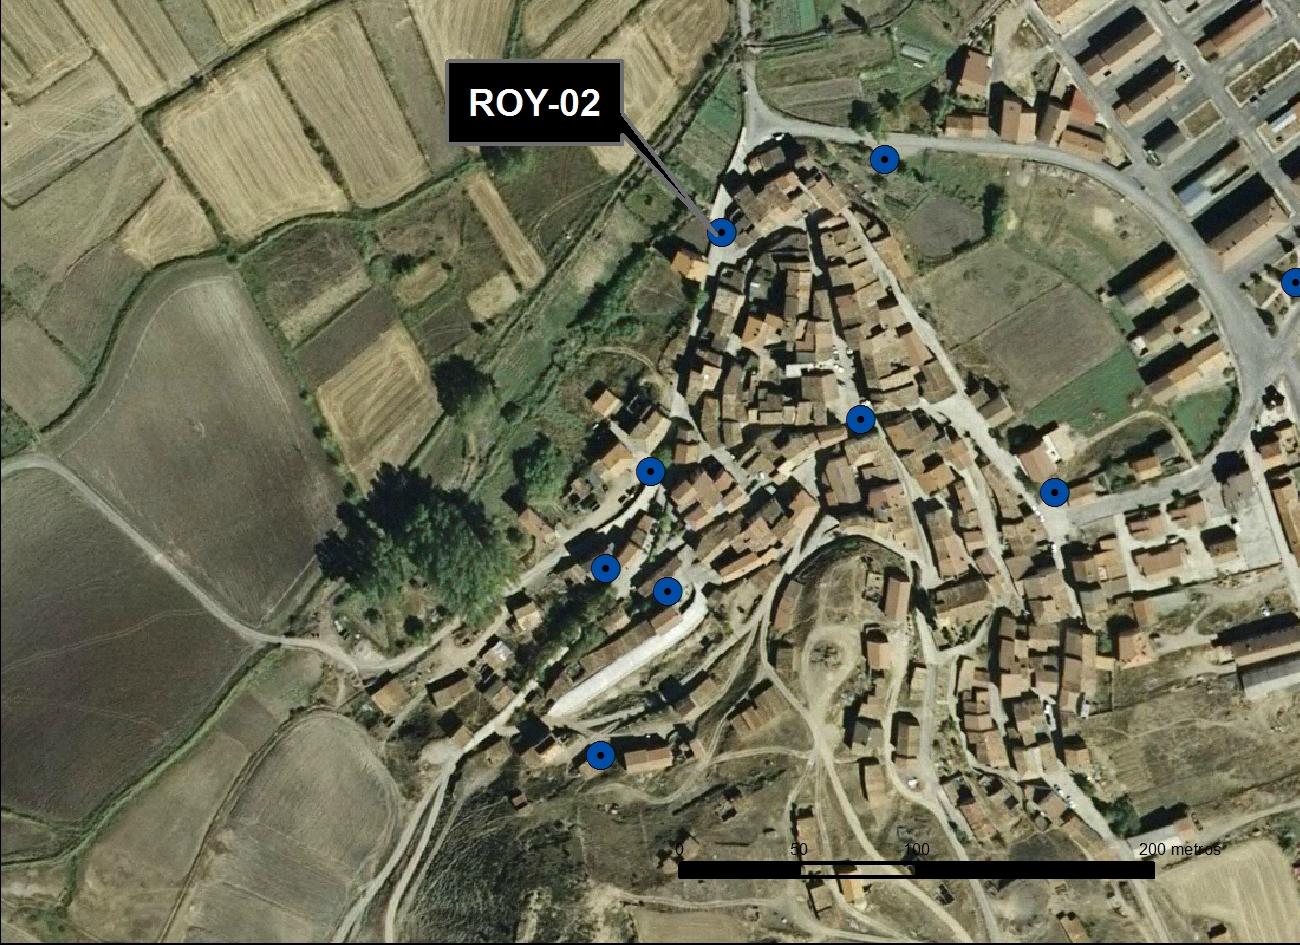 ROY_02_M.V.LOZANO_ TÍO PÍO_ORTO 1